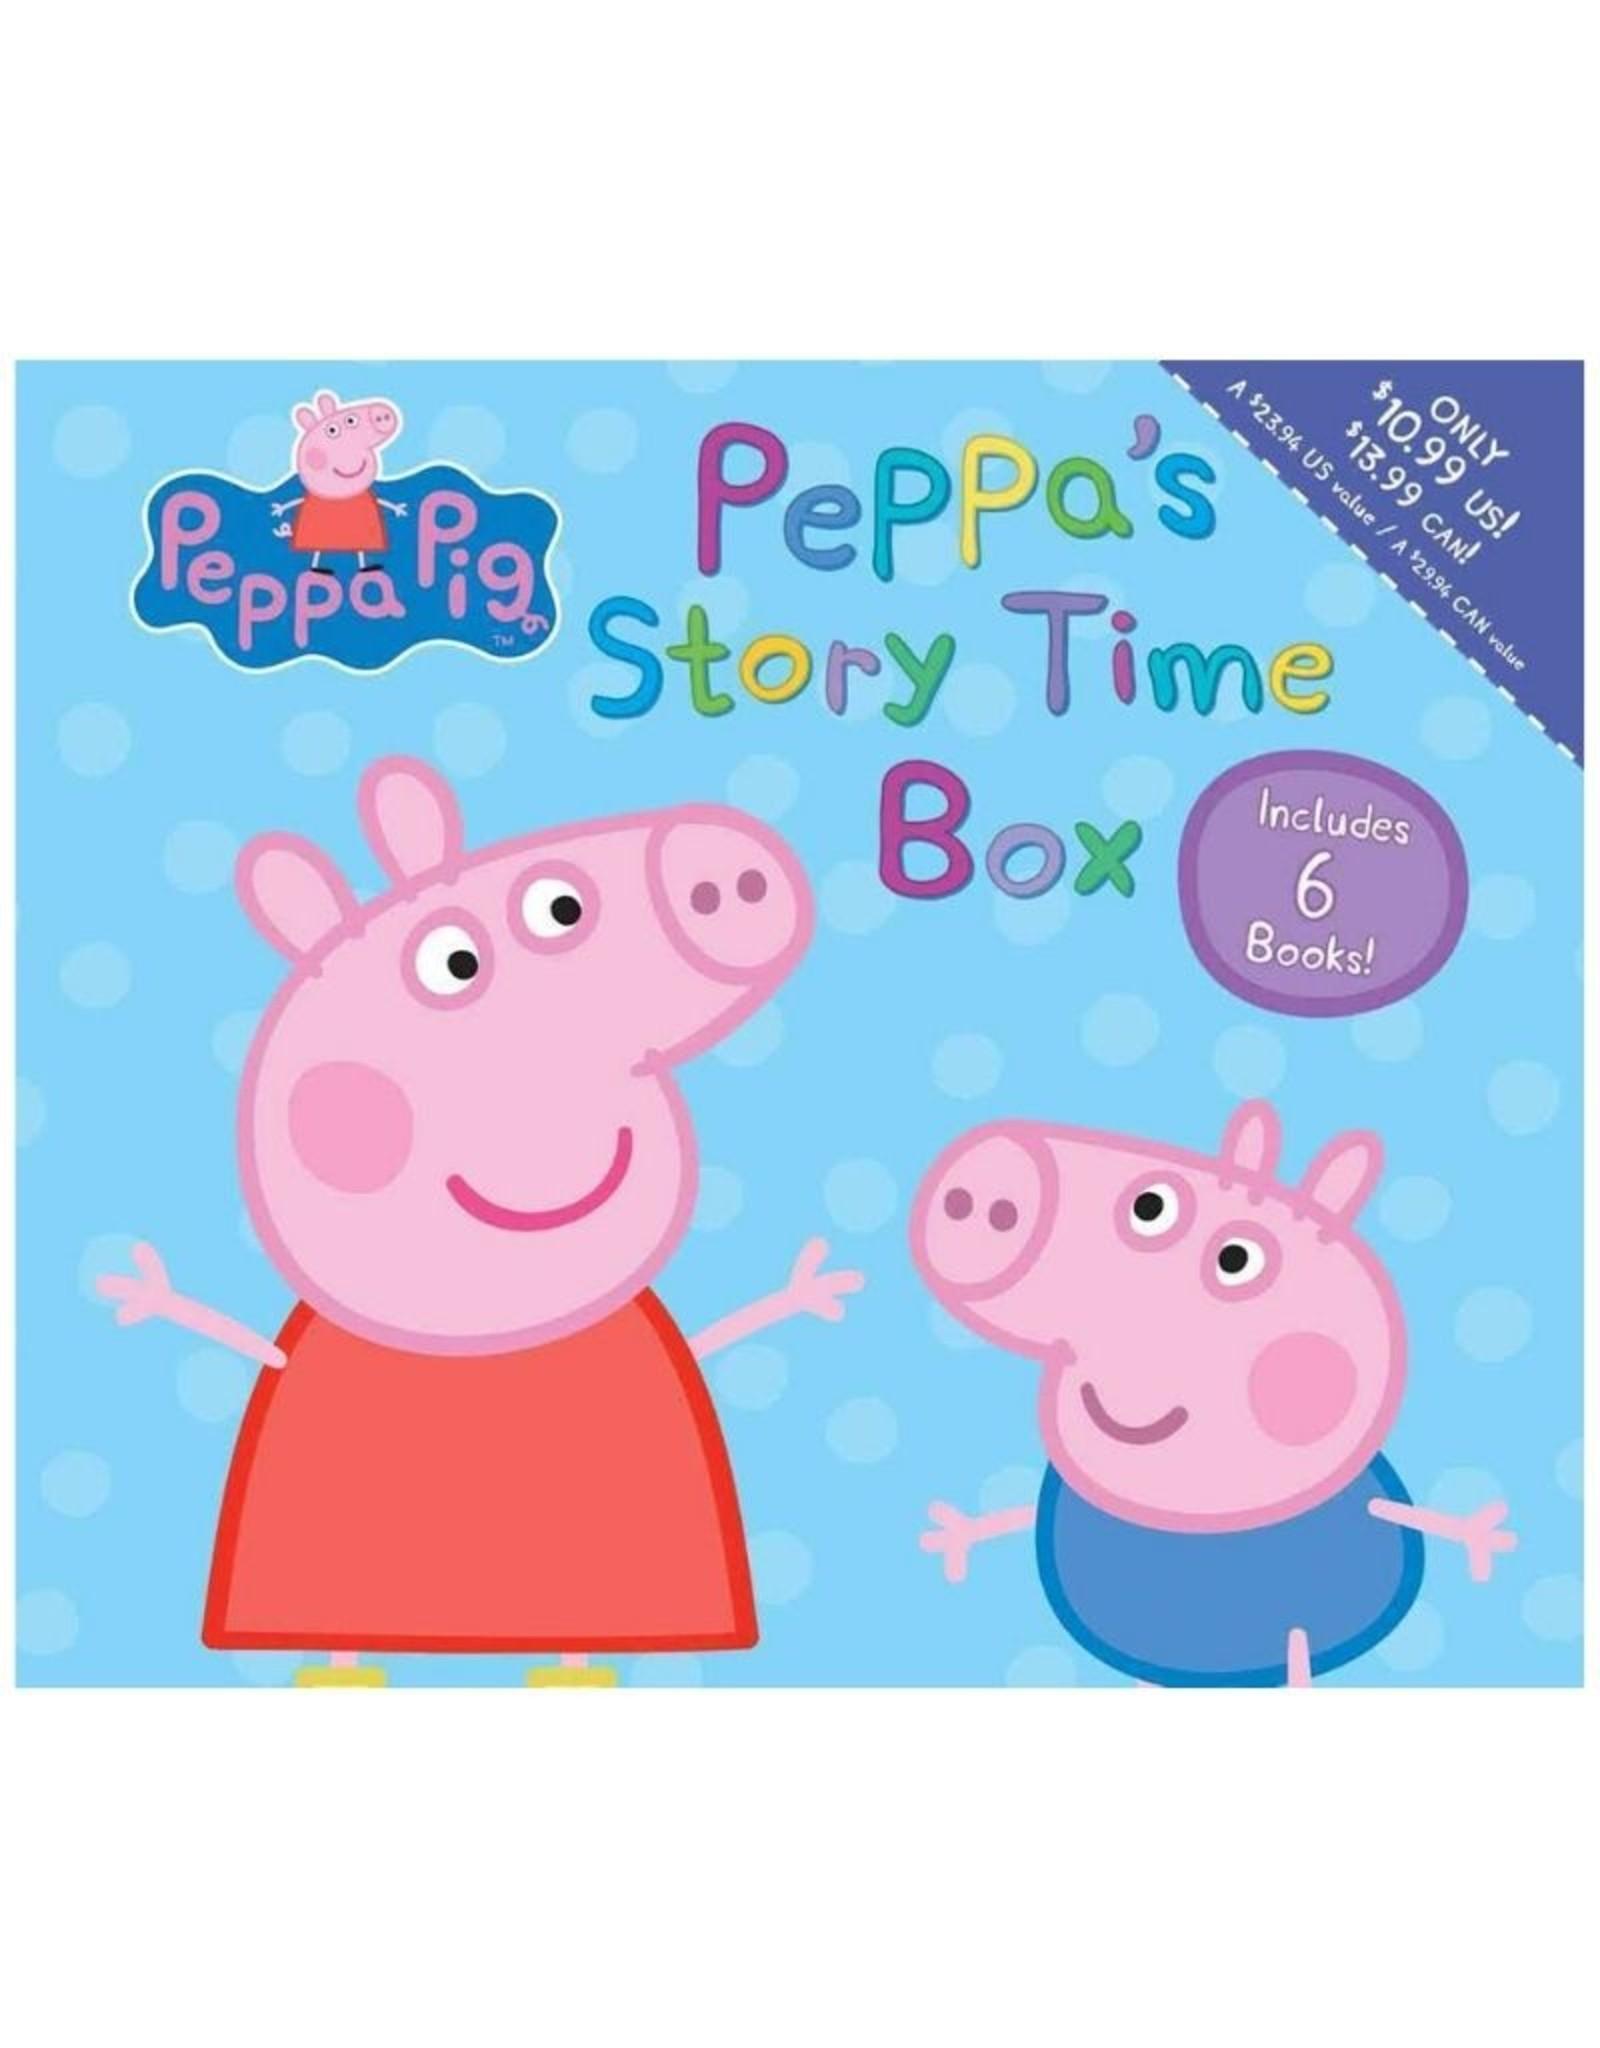 Peppa Pig Story Time Box